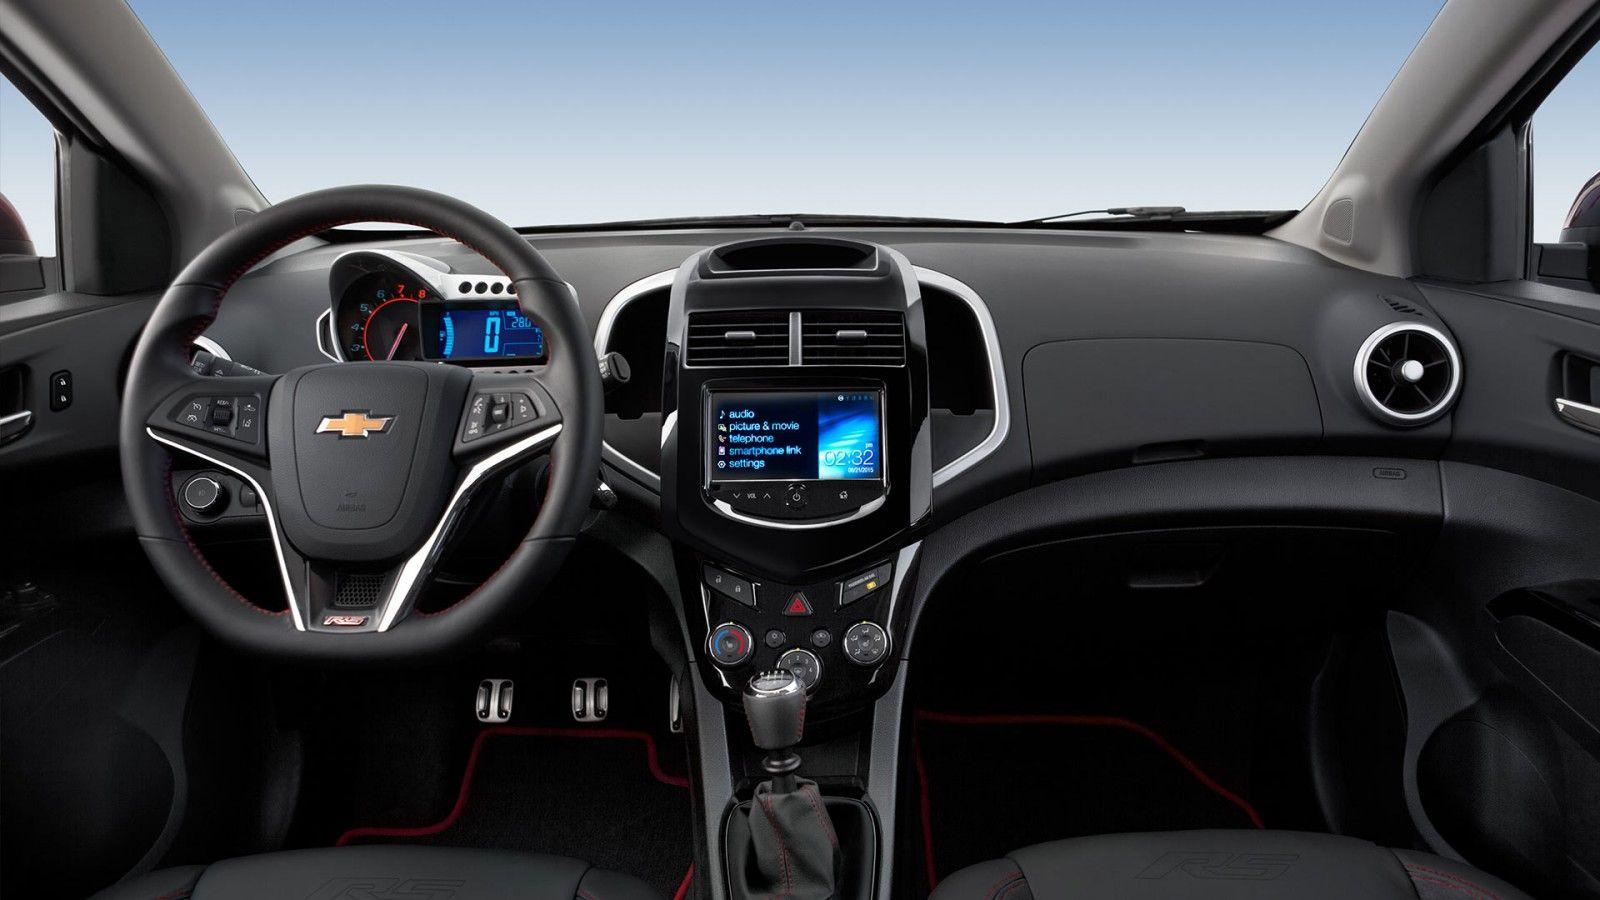 2016 Sonic Interior Photos Chevy Sonic Chevrolet Sonic Chevrolet